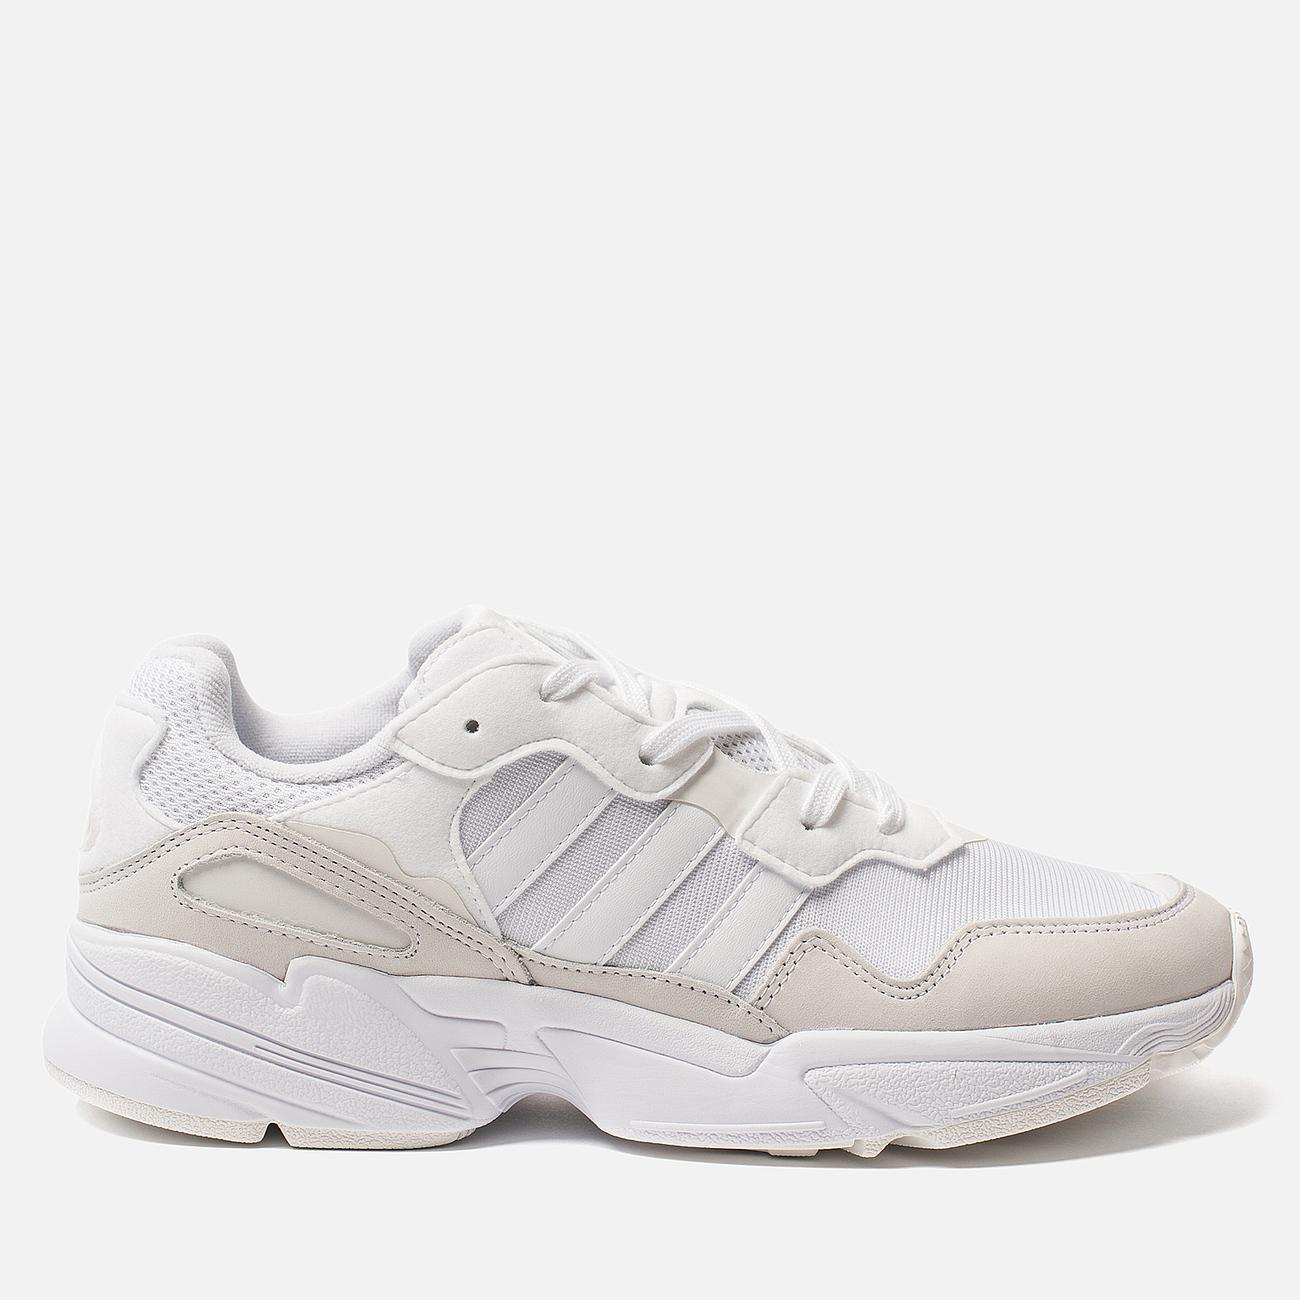 Мужские кроссовки adidas Originals Yung-96 Cloud White/Cloud White/Grey Two